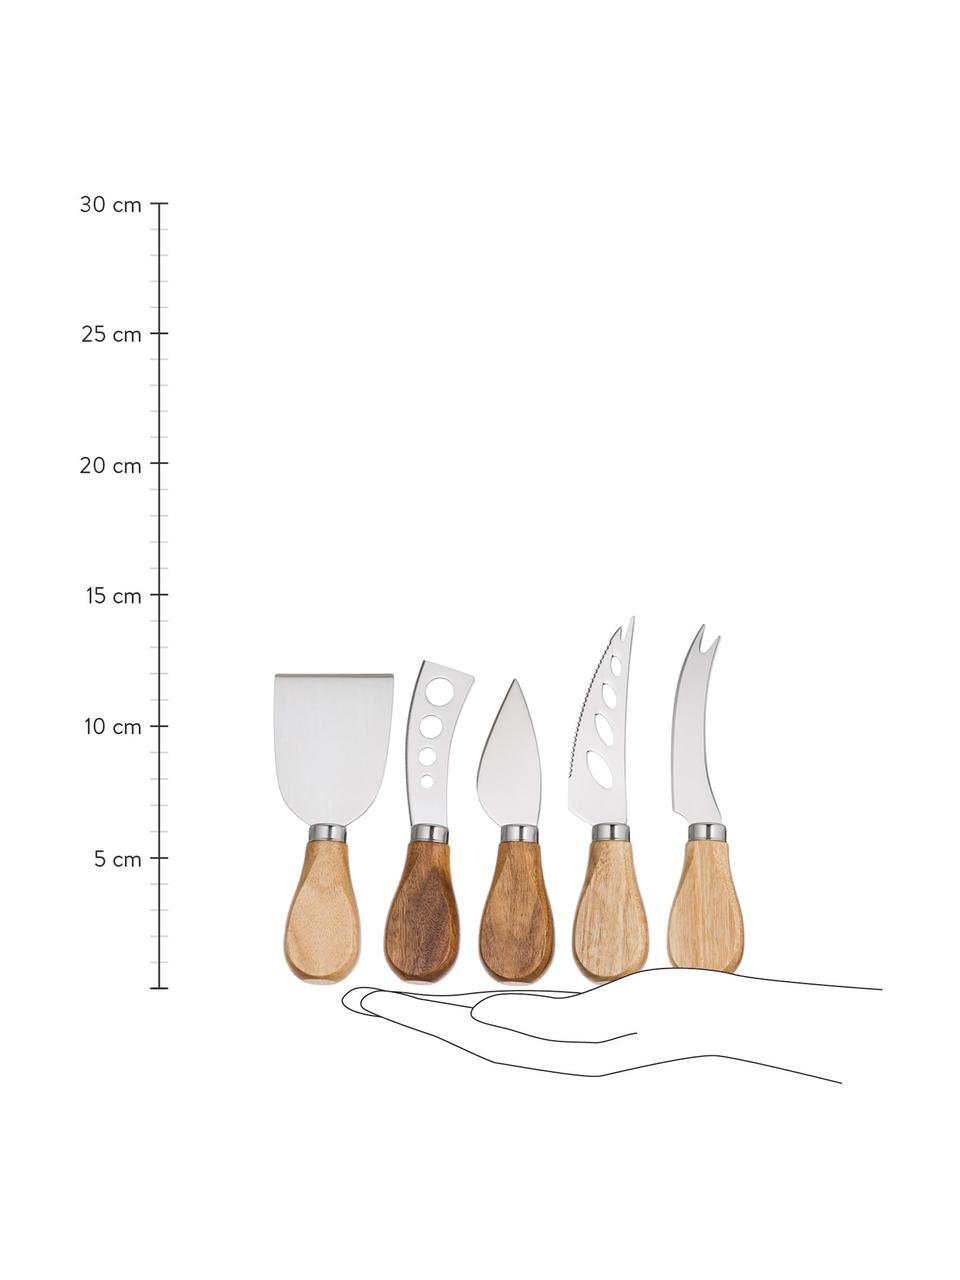 Silbernes Käsemesser-Set Frija aus Edelstahl mit Akazienholzgriff, 5-teilig, Griffe: Akazienholz, Akazienholz, Edelstahl, Sondergrößen